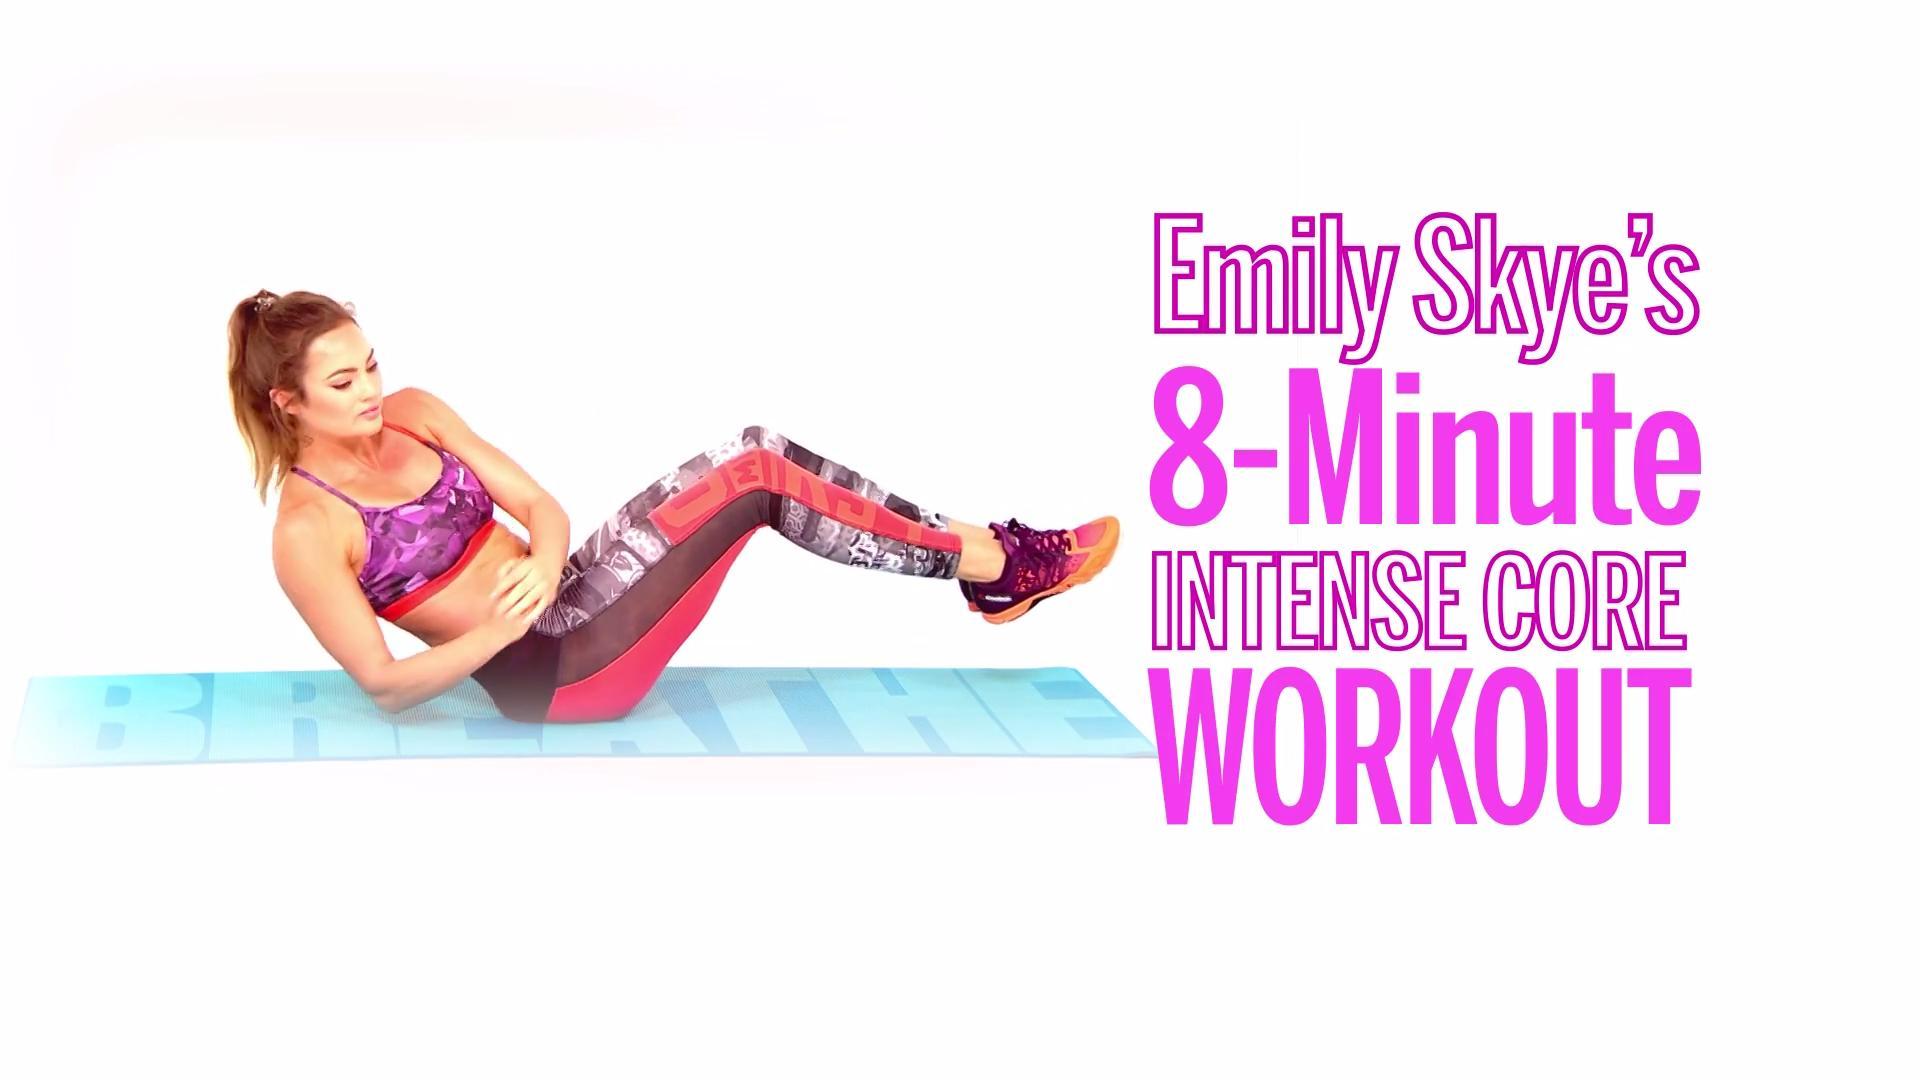 Emily Skye's 8-Minute Intense Core Workout